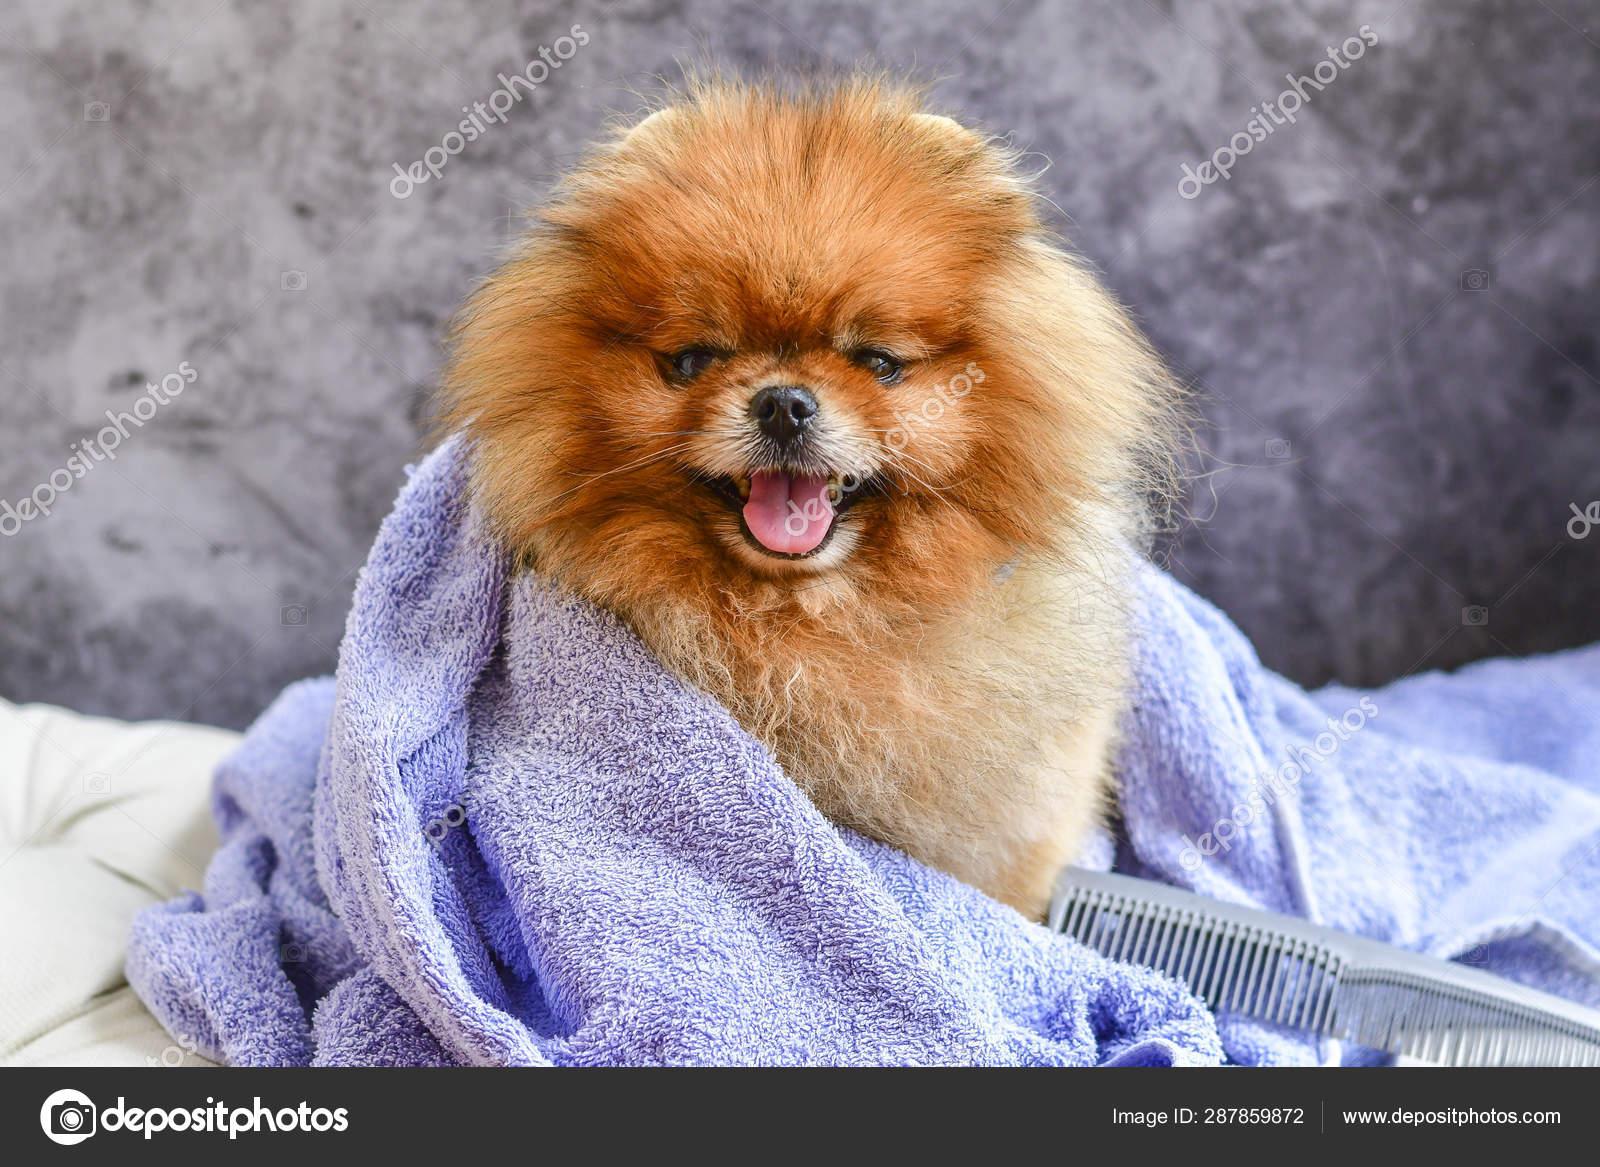 Cute Small Happy Fluffy Pomeranian Dog Towel Bath Grooming Stock Photo C Gk1982 287859872